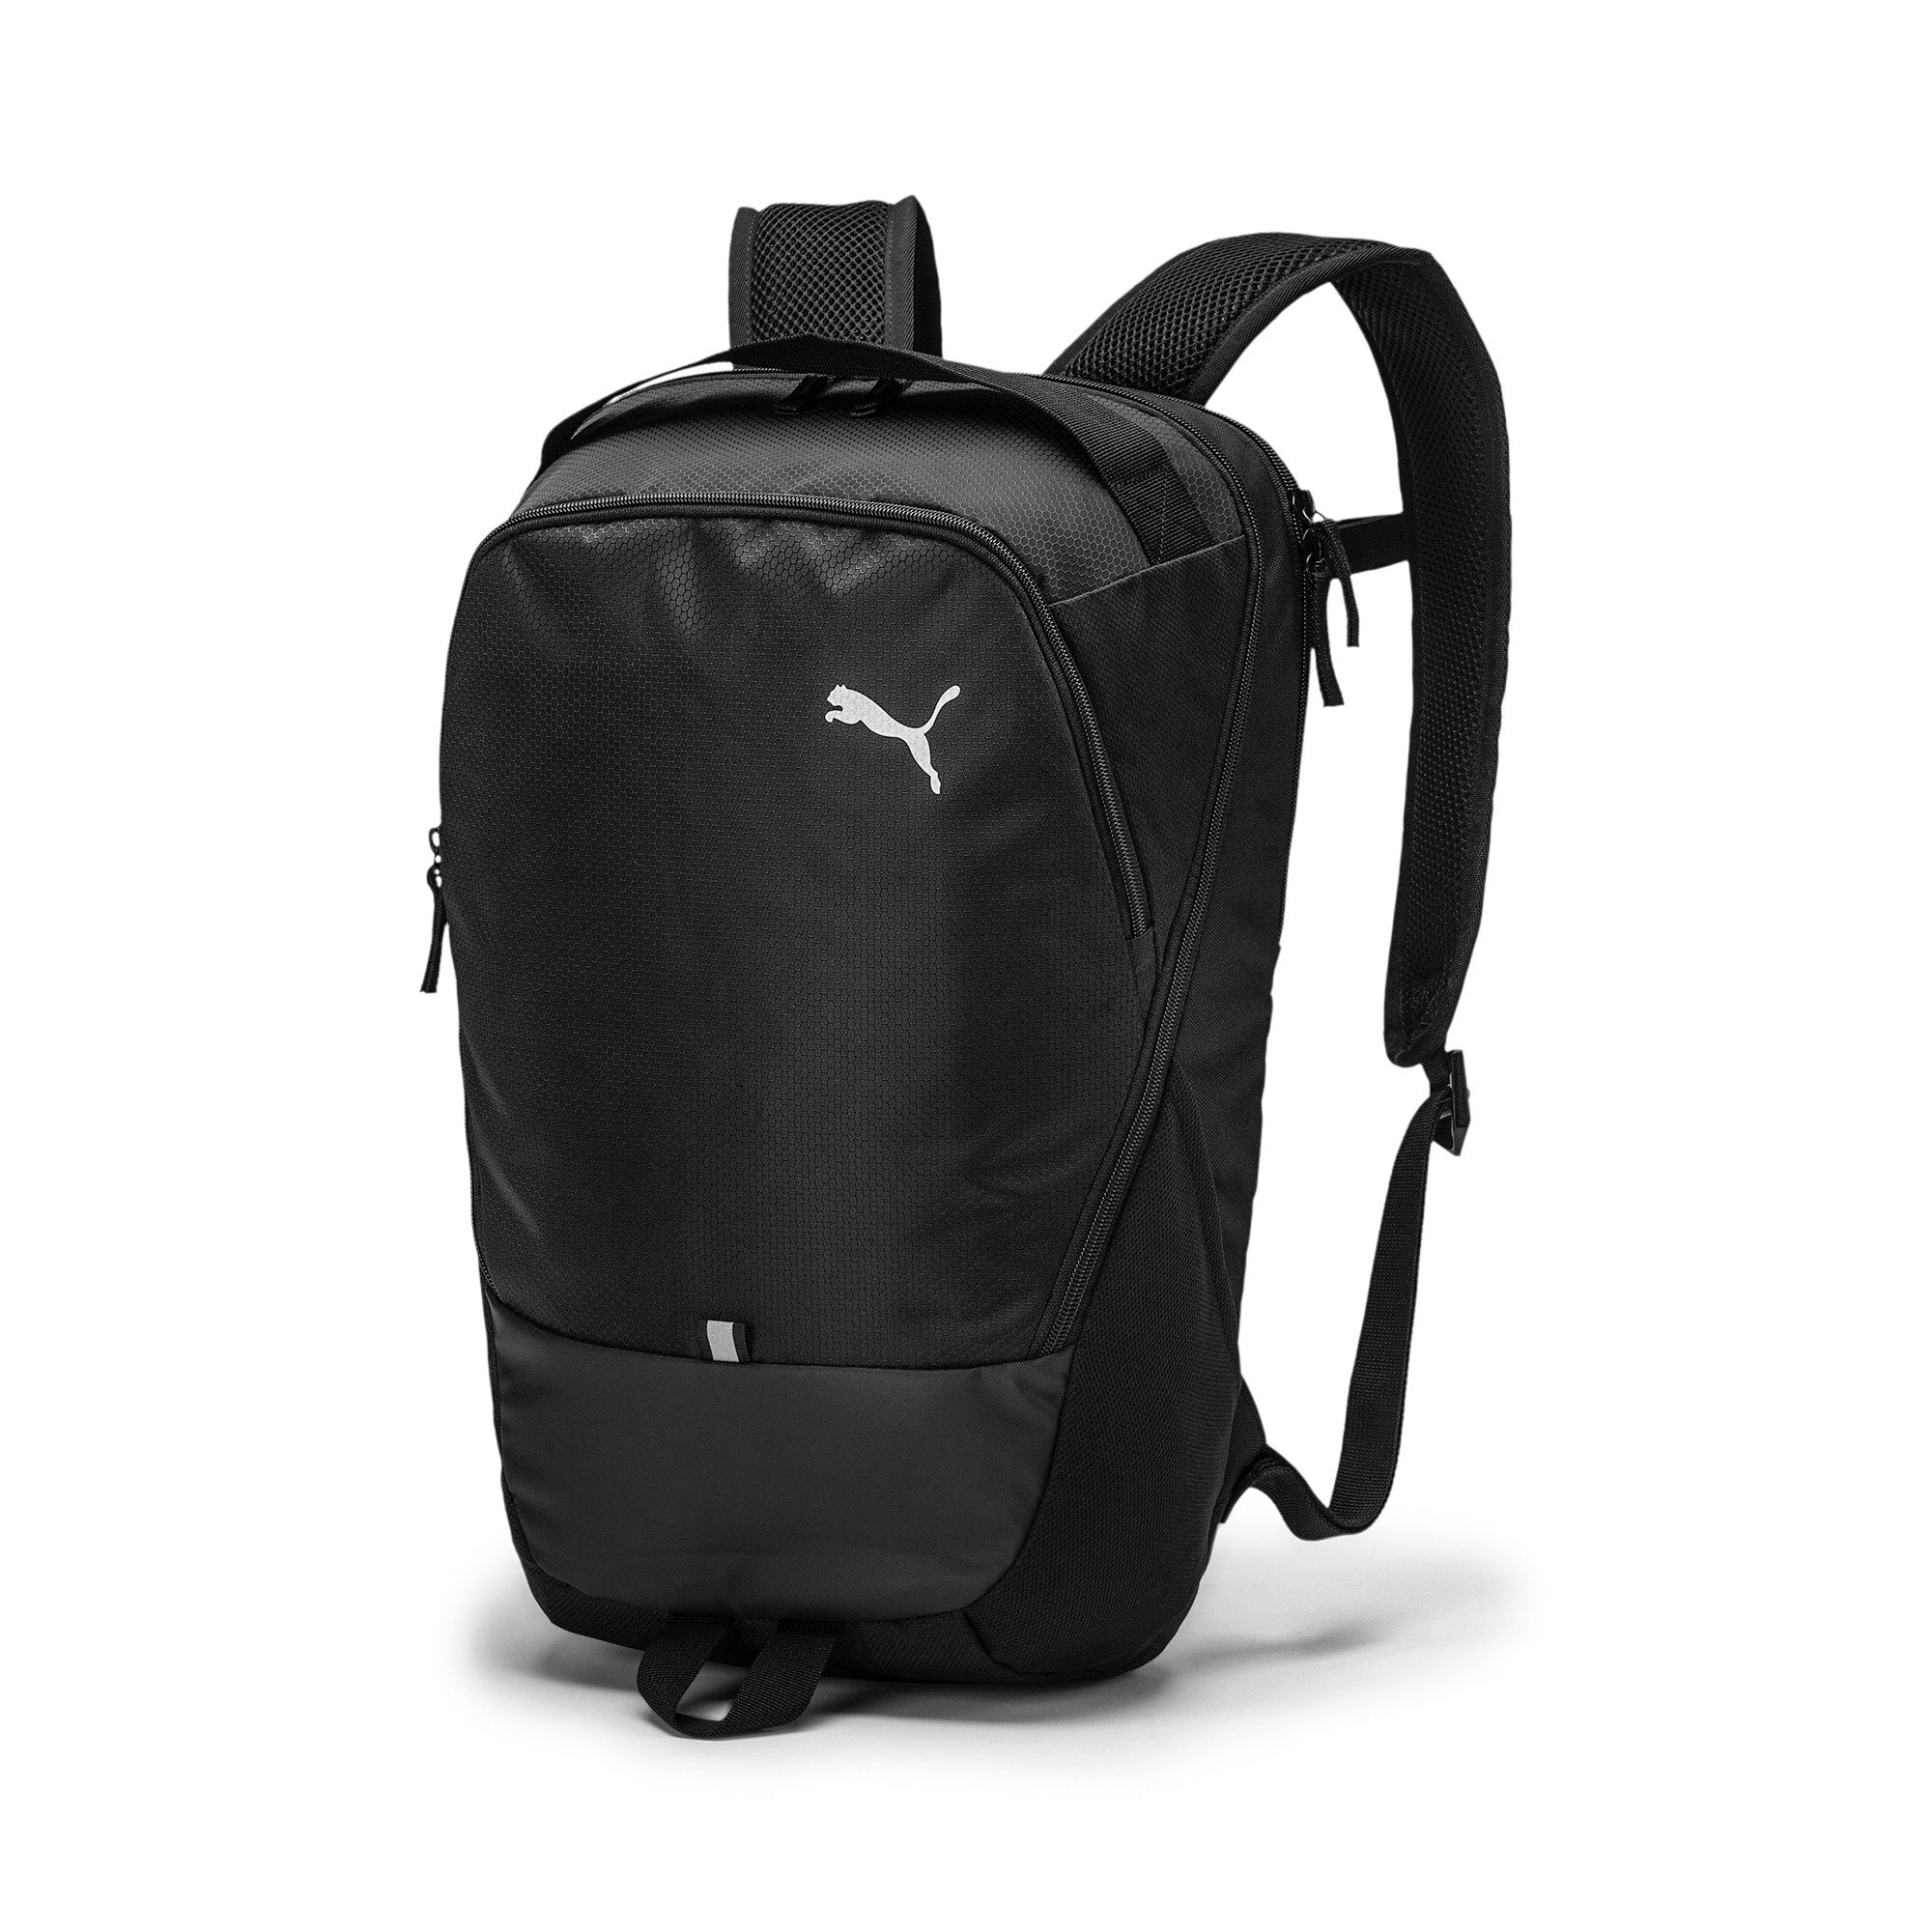 Thumbnail 1 of PUMA X Backpack, Puma Black, medium